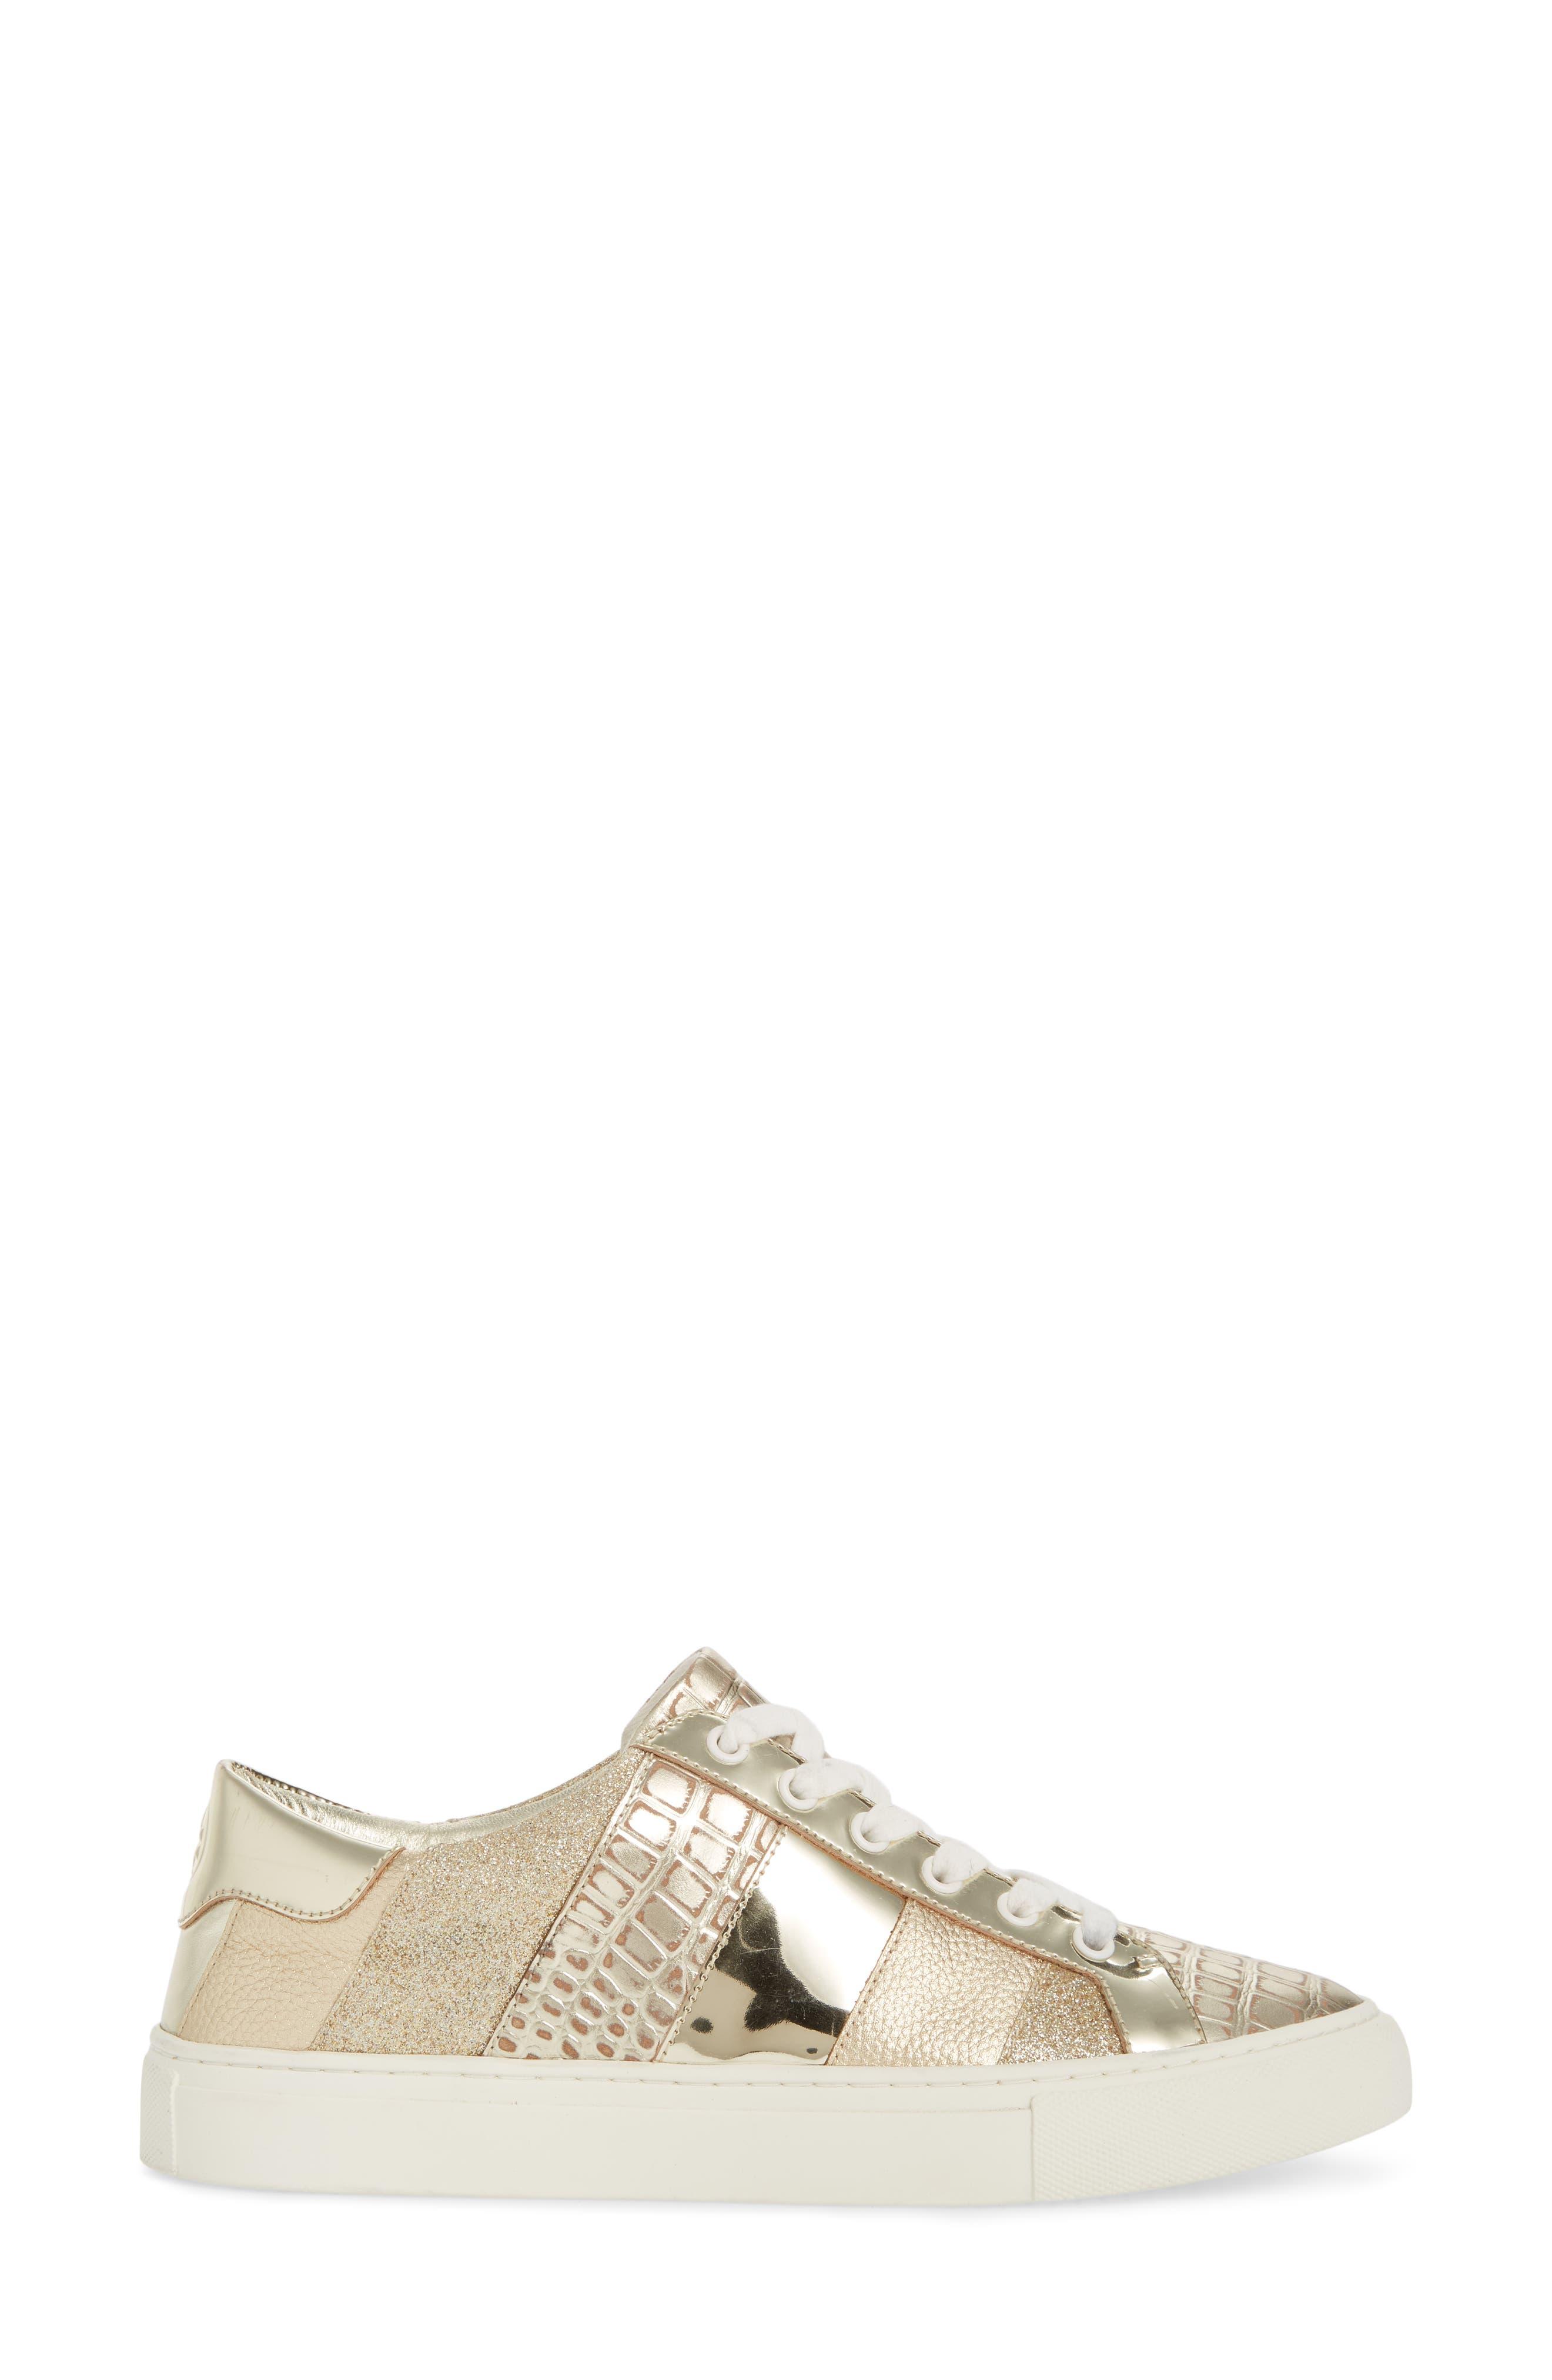 Ames Sneaker,                             Alternate thumbnail 3, color,                             723